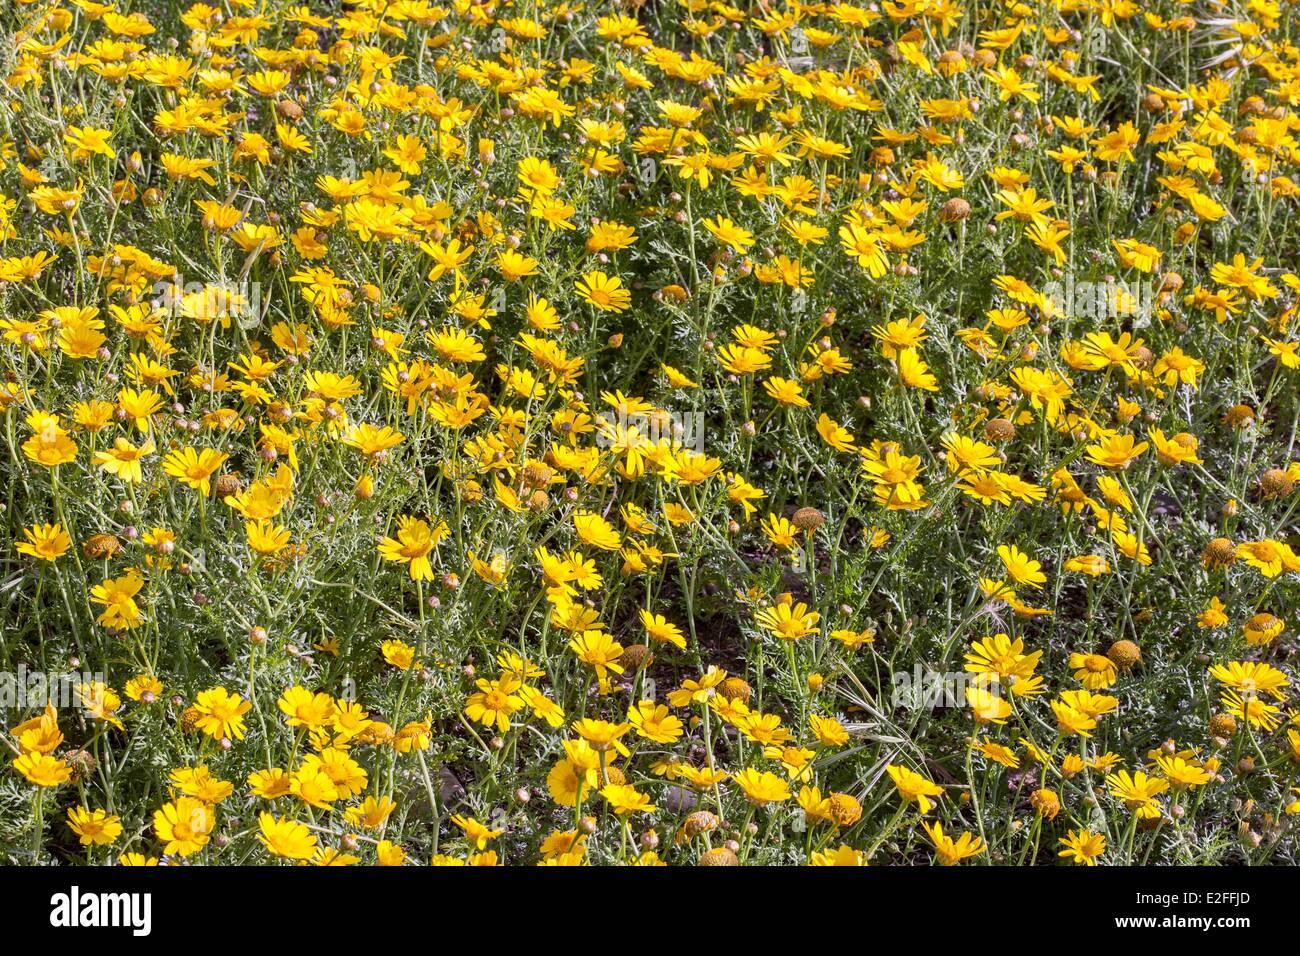 Cyprus, Paphos, yellow daisies - Stock Image